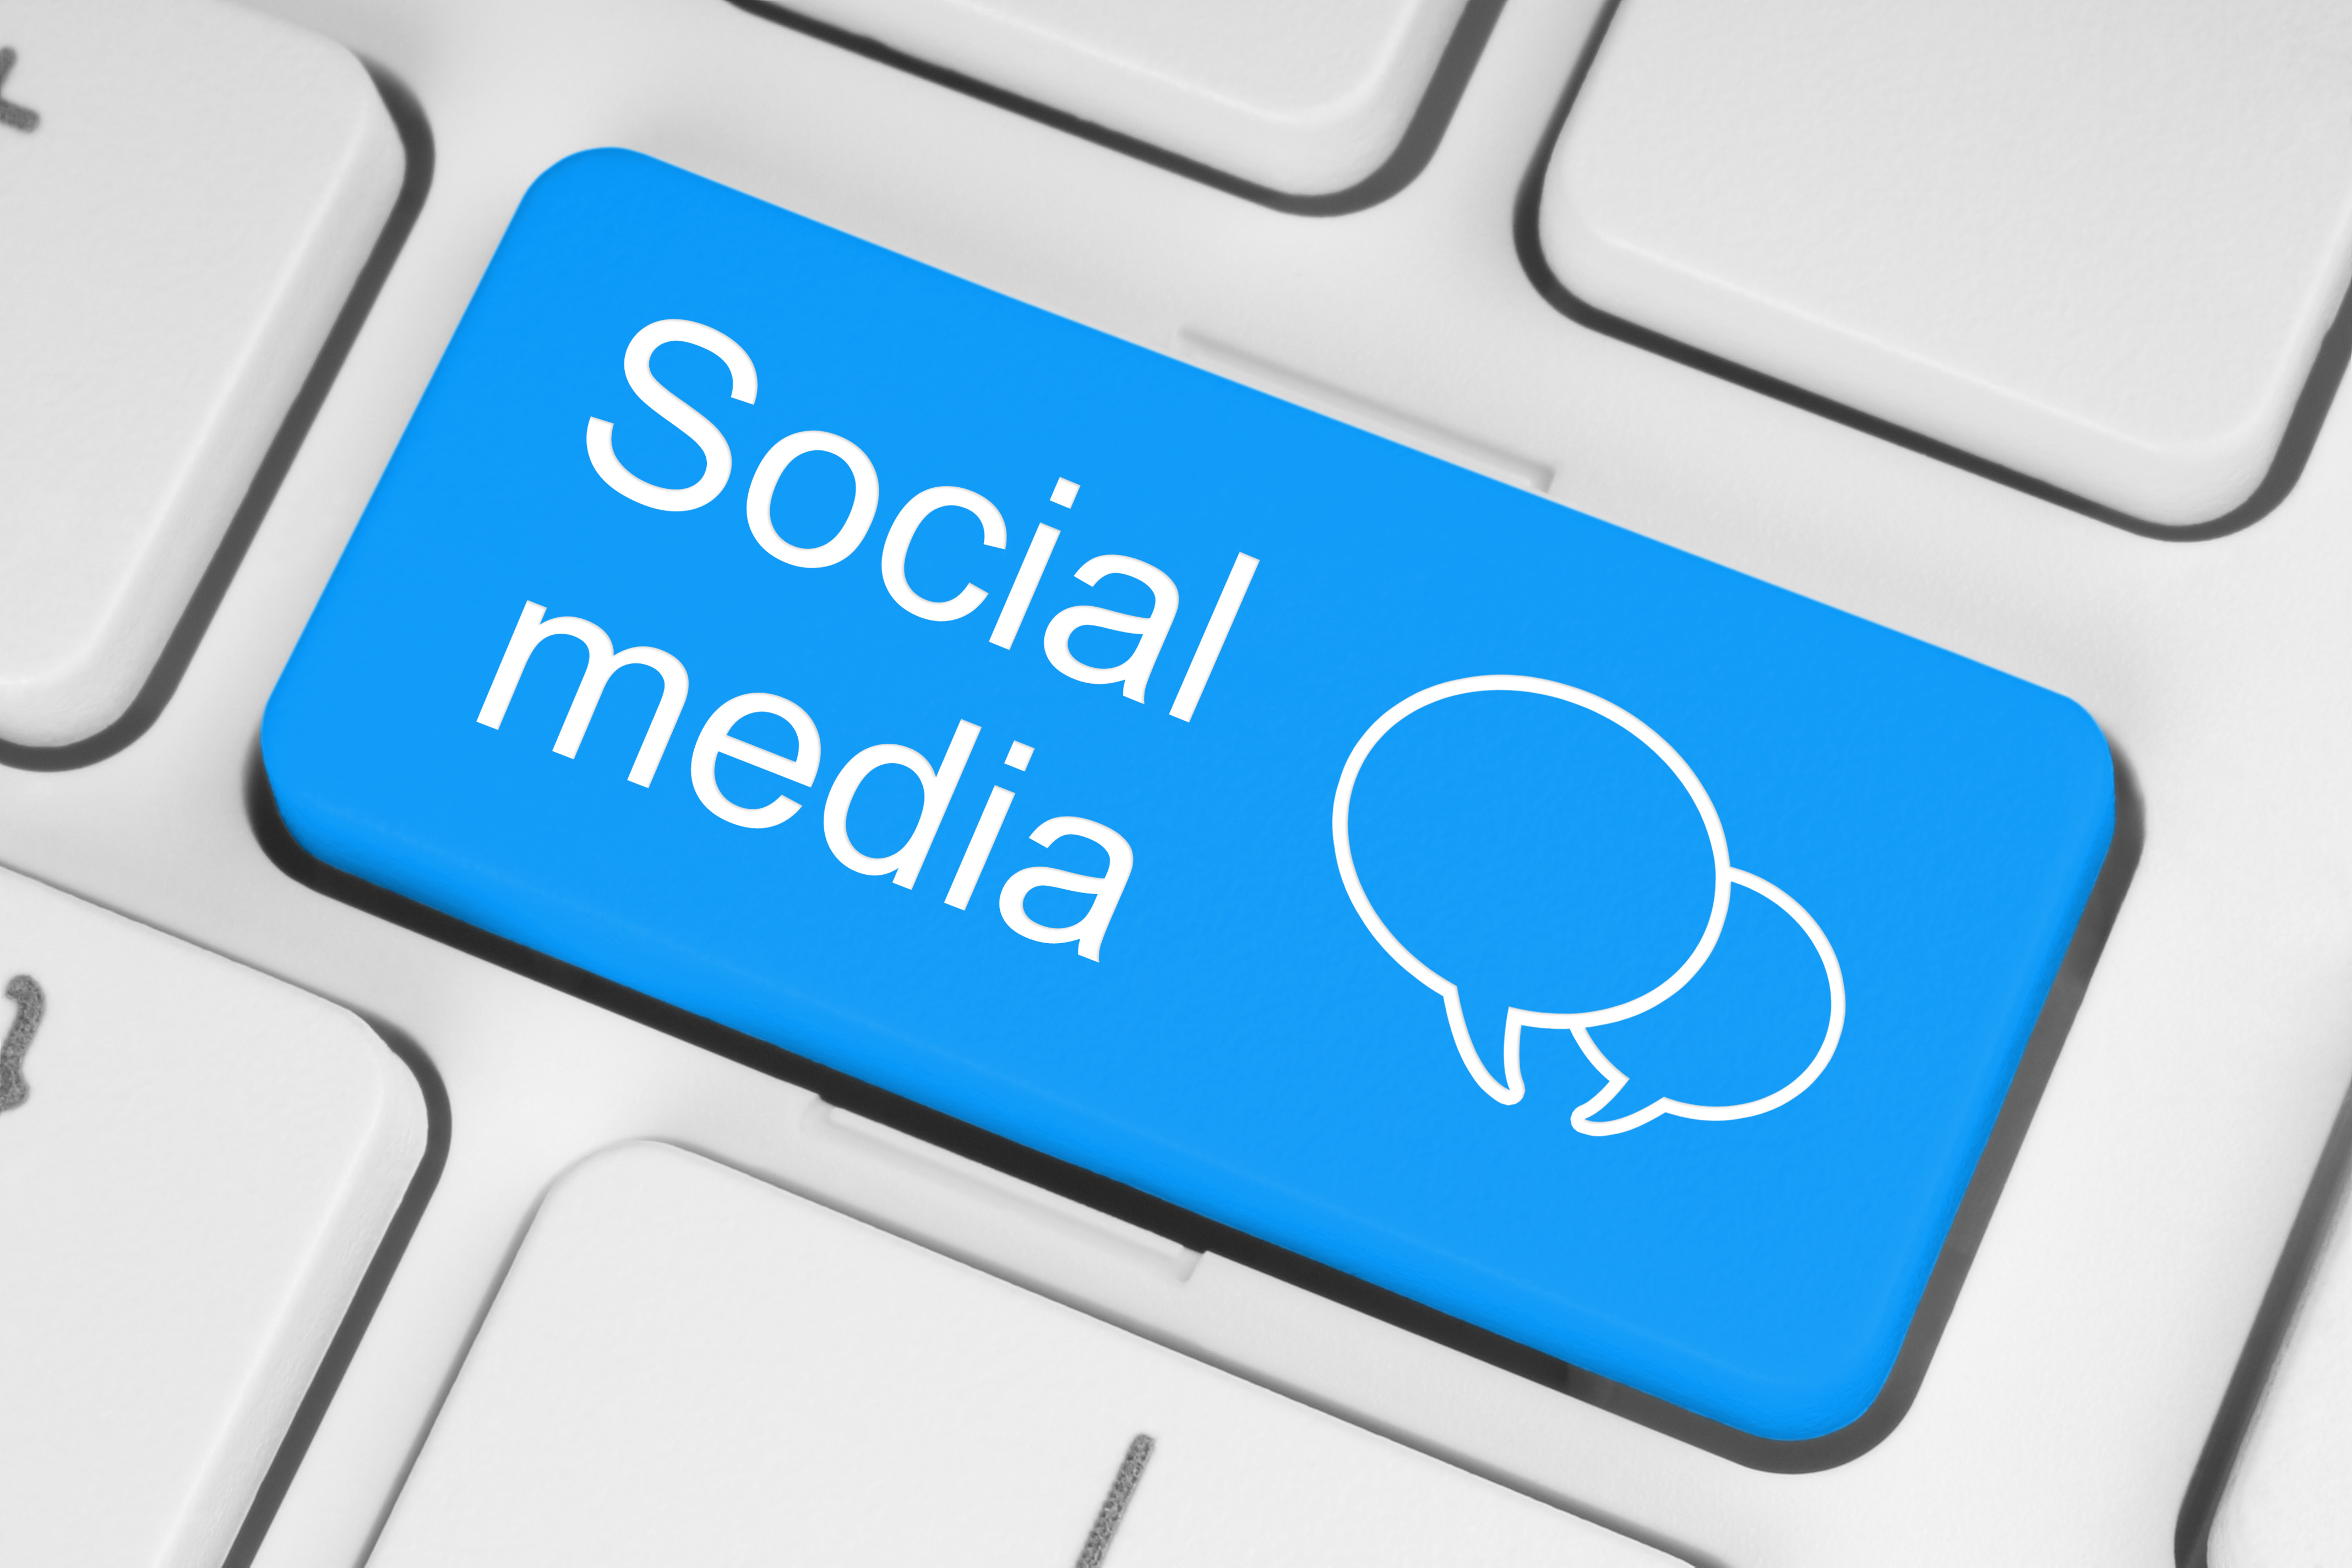 Social-Media-Key-HD-Wallpapers